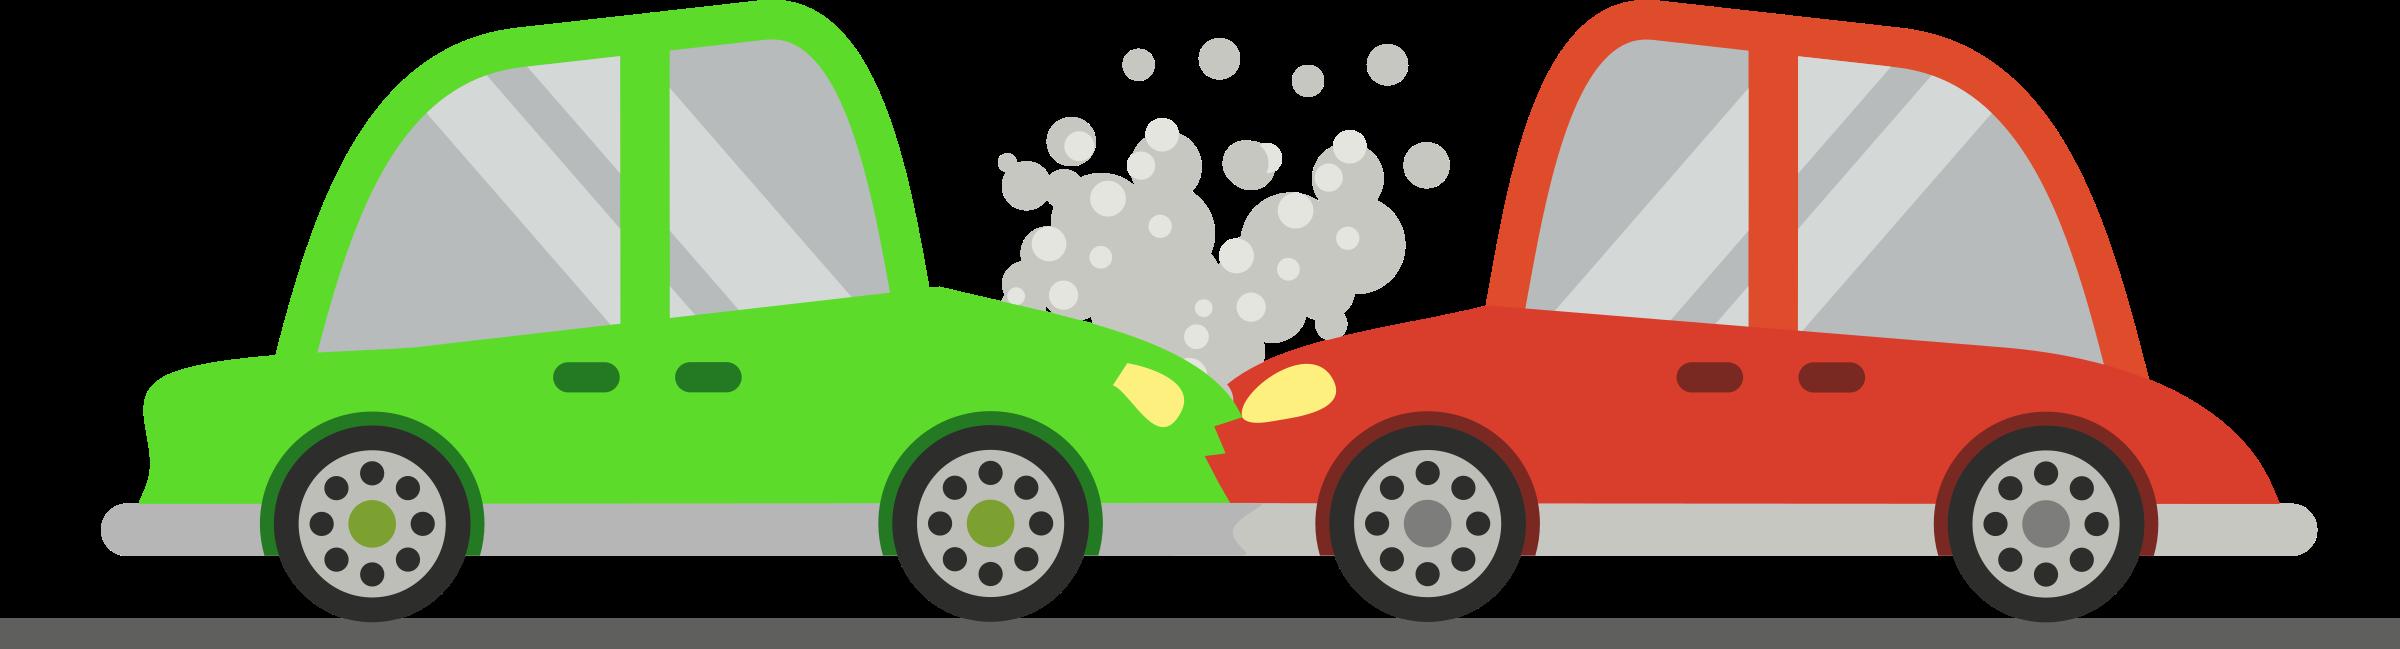 Car Crash Png , (+) Png Group.